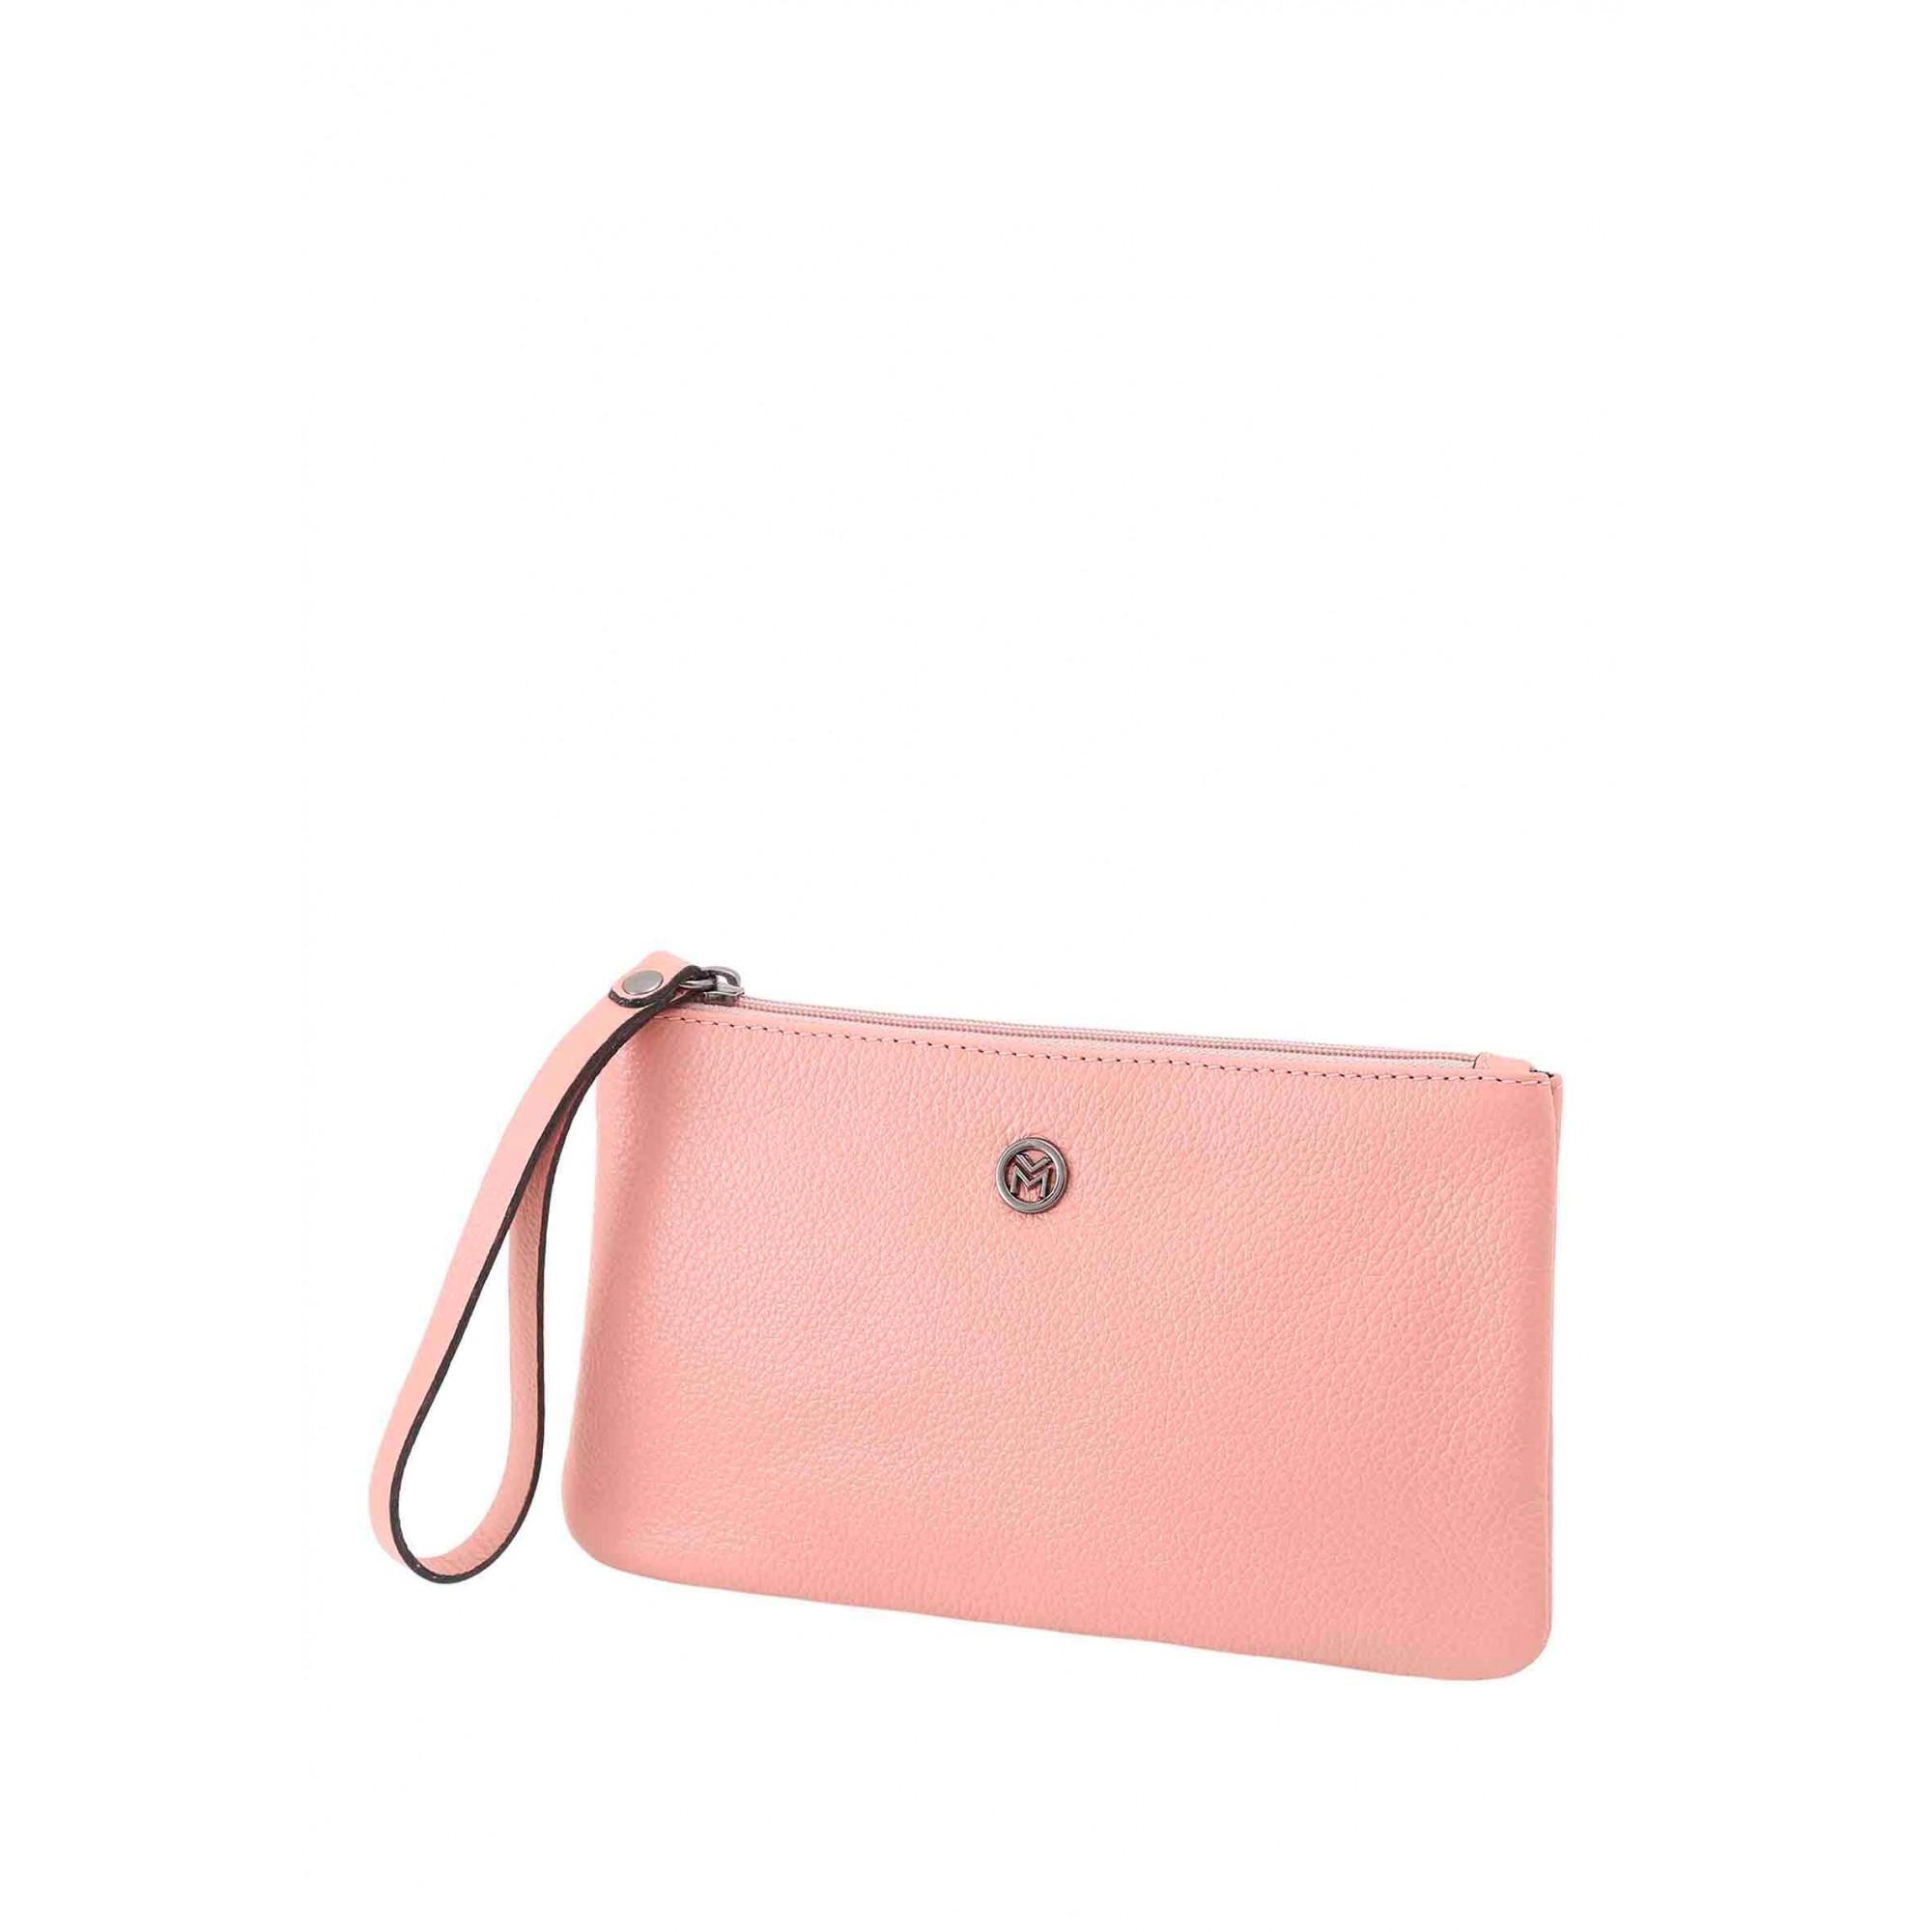 Bolsa Carteira Clutch Couro Mariart 263C Cores Rosé